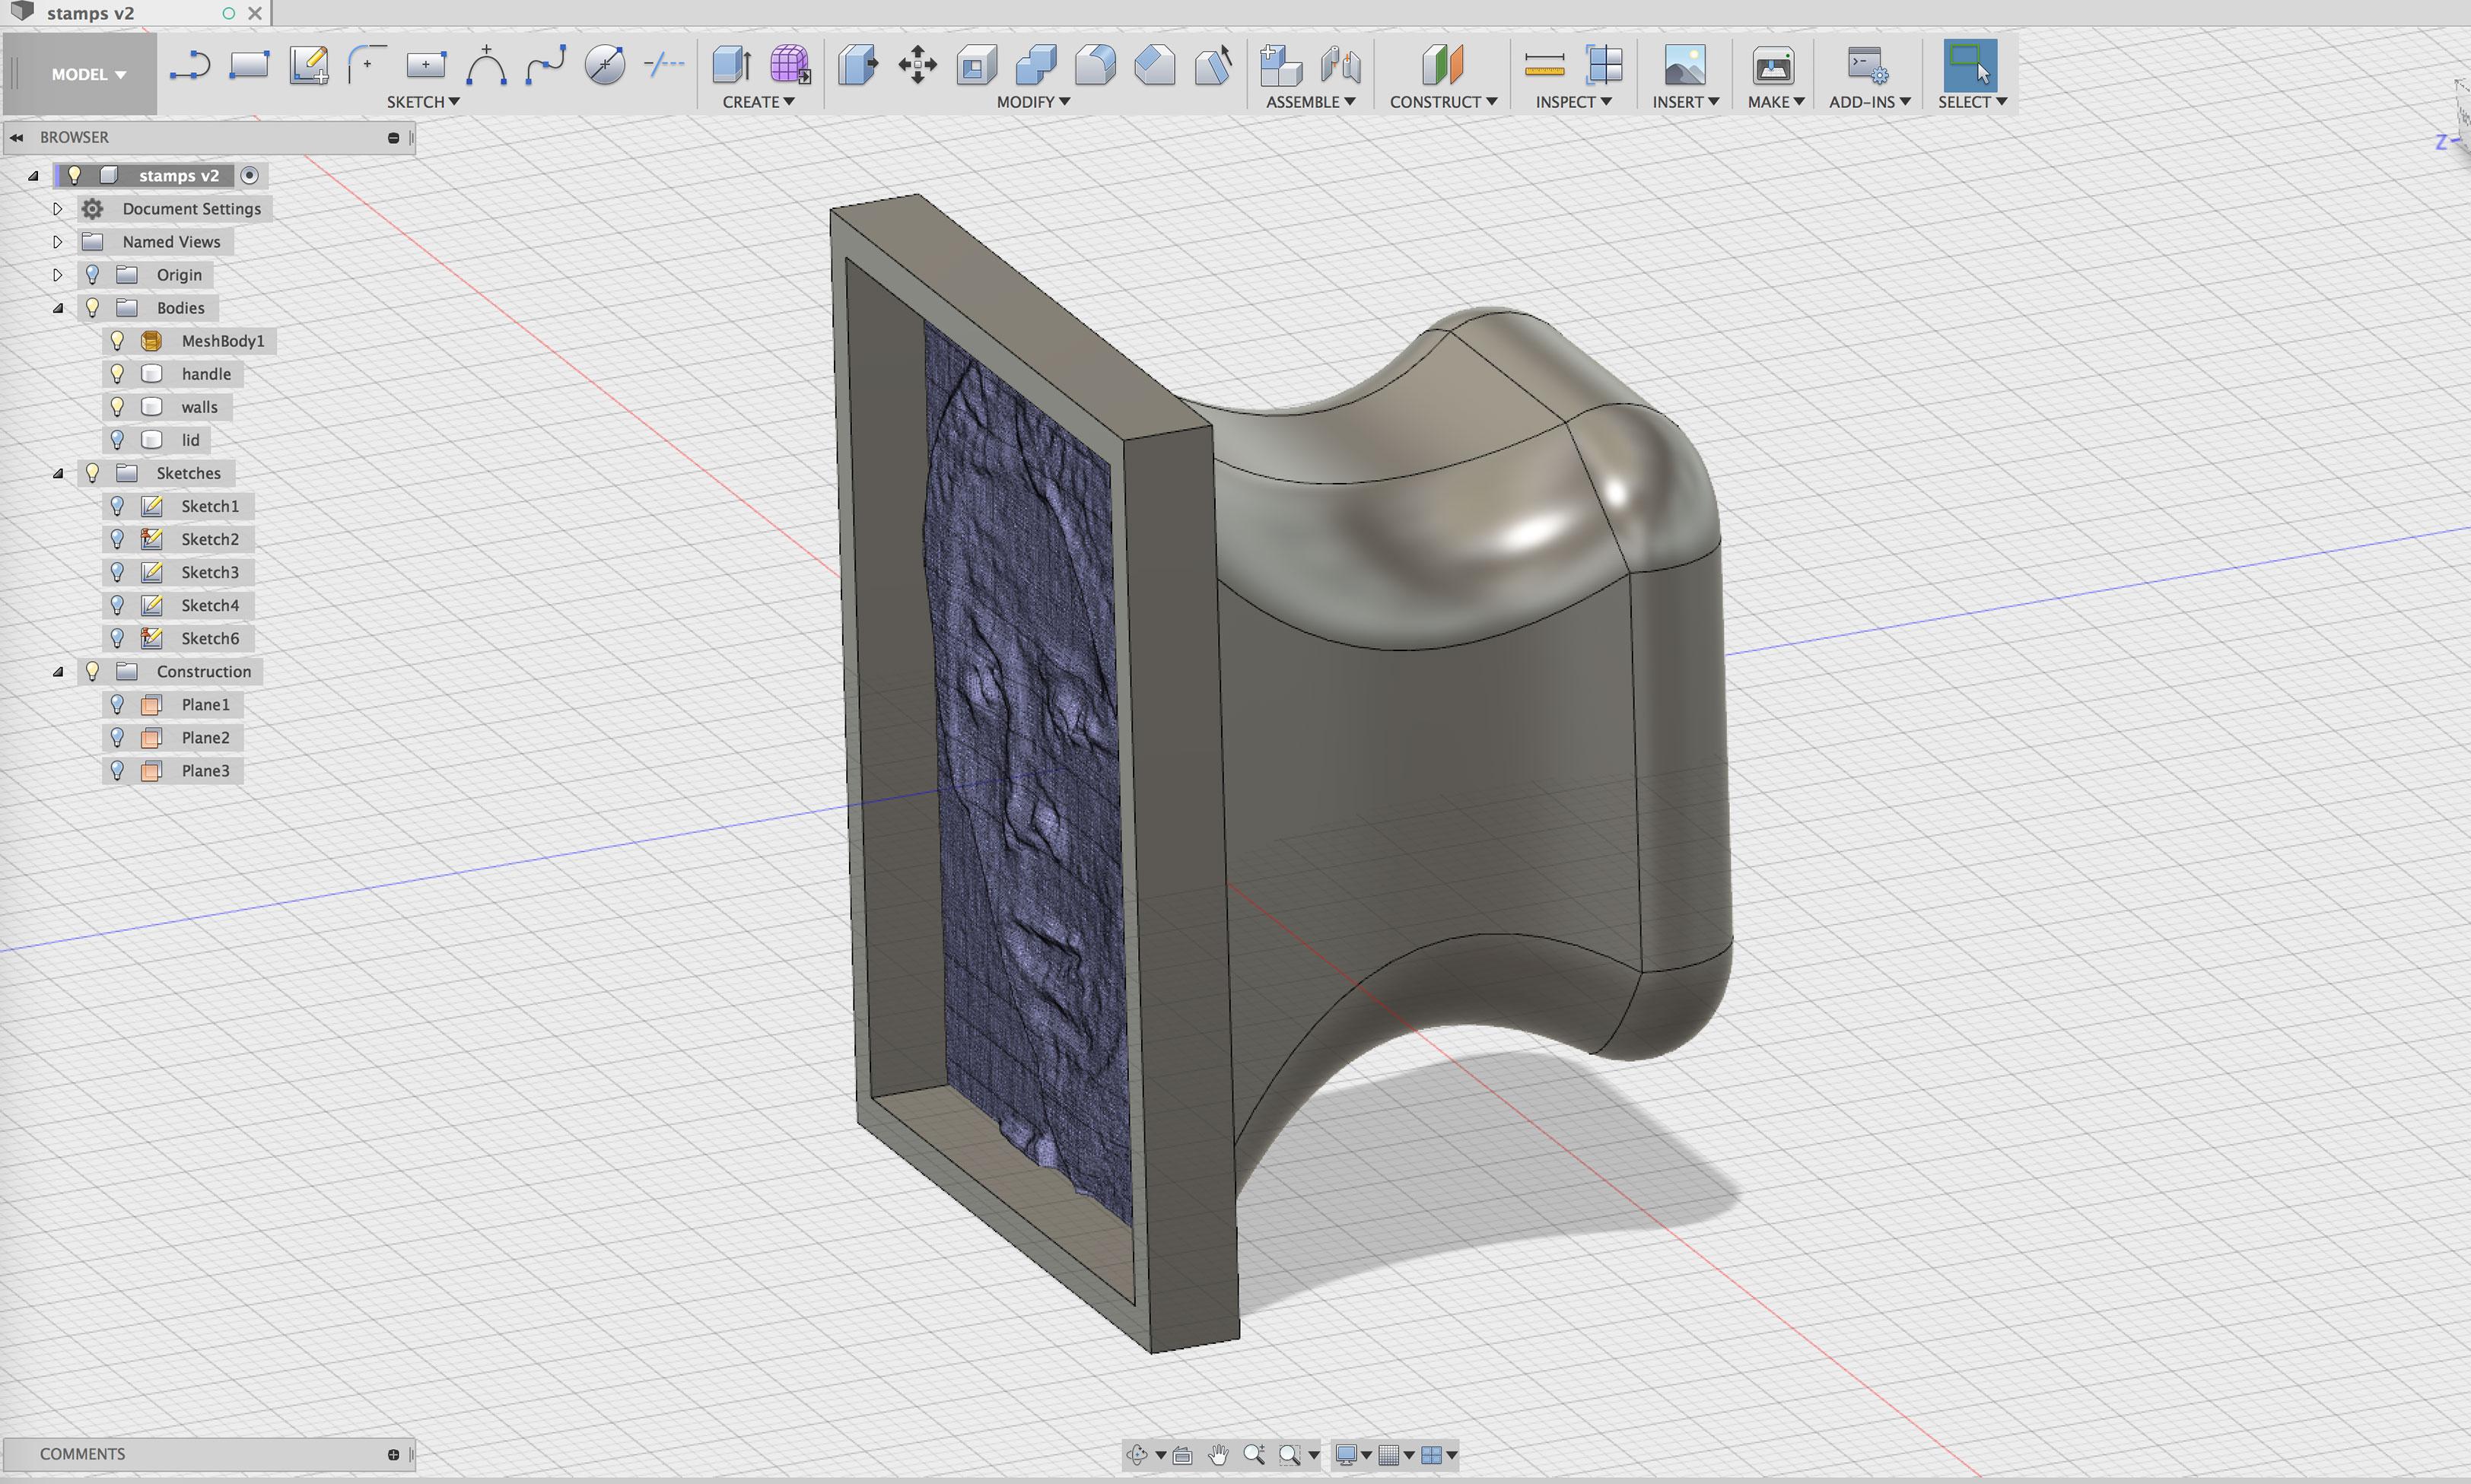 3d_printing_image-walls.jpg